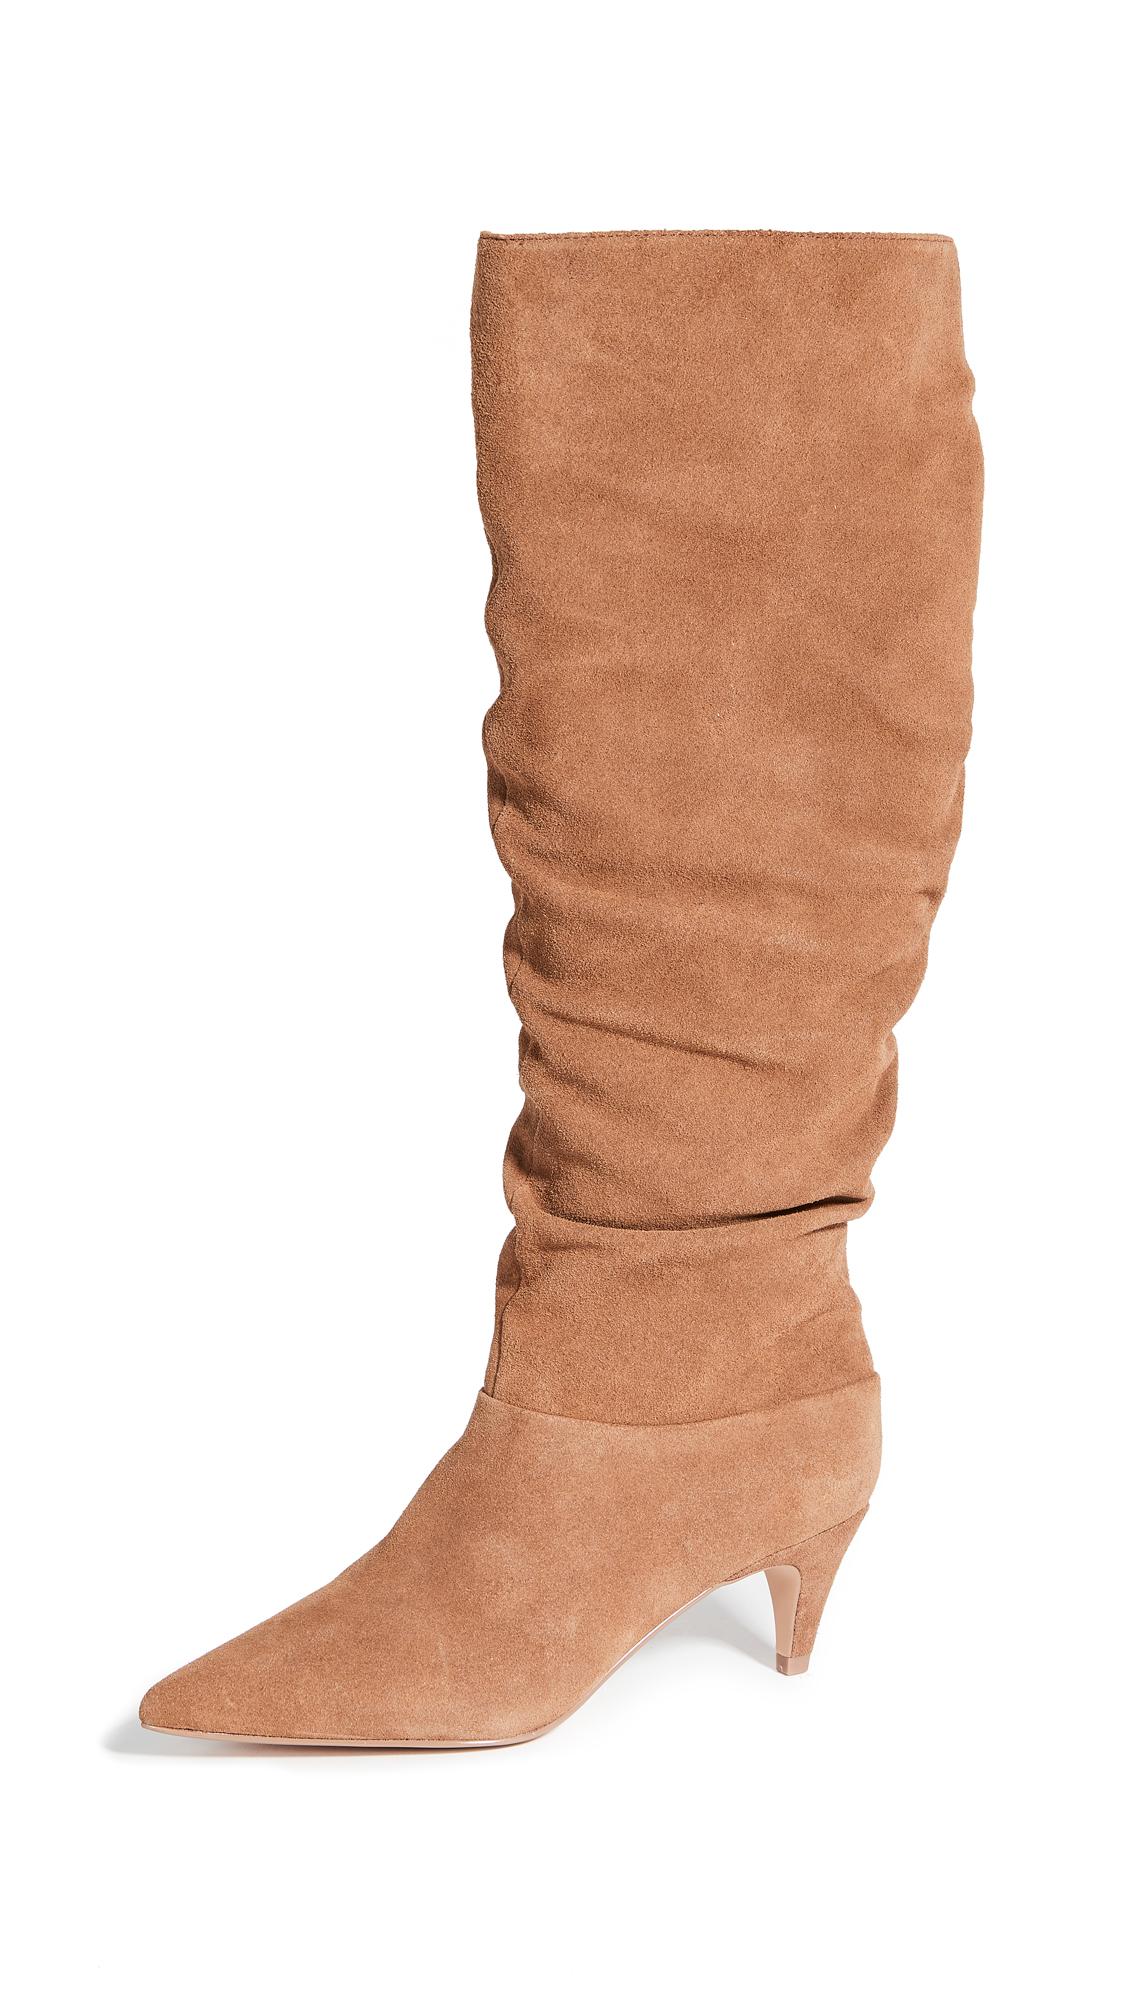 Villa Rouge Scarlett Knee High Boots